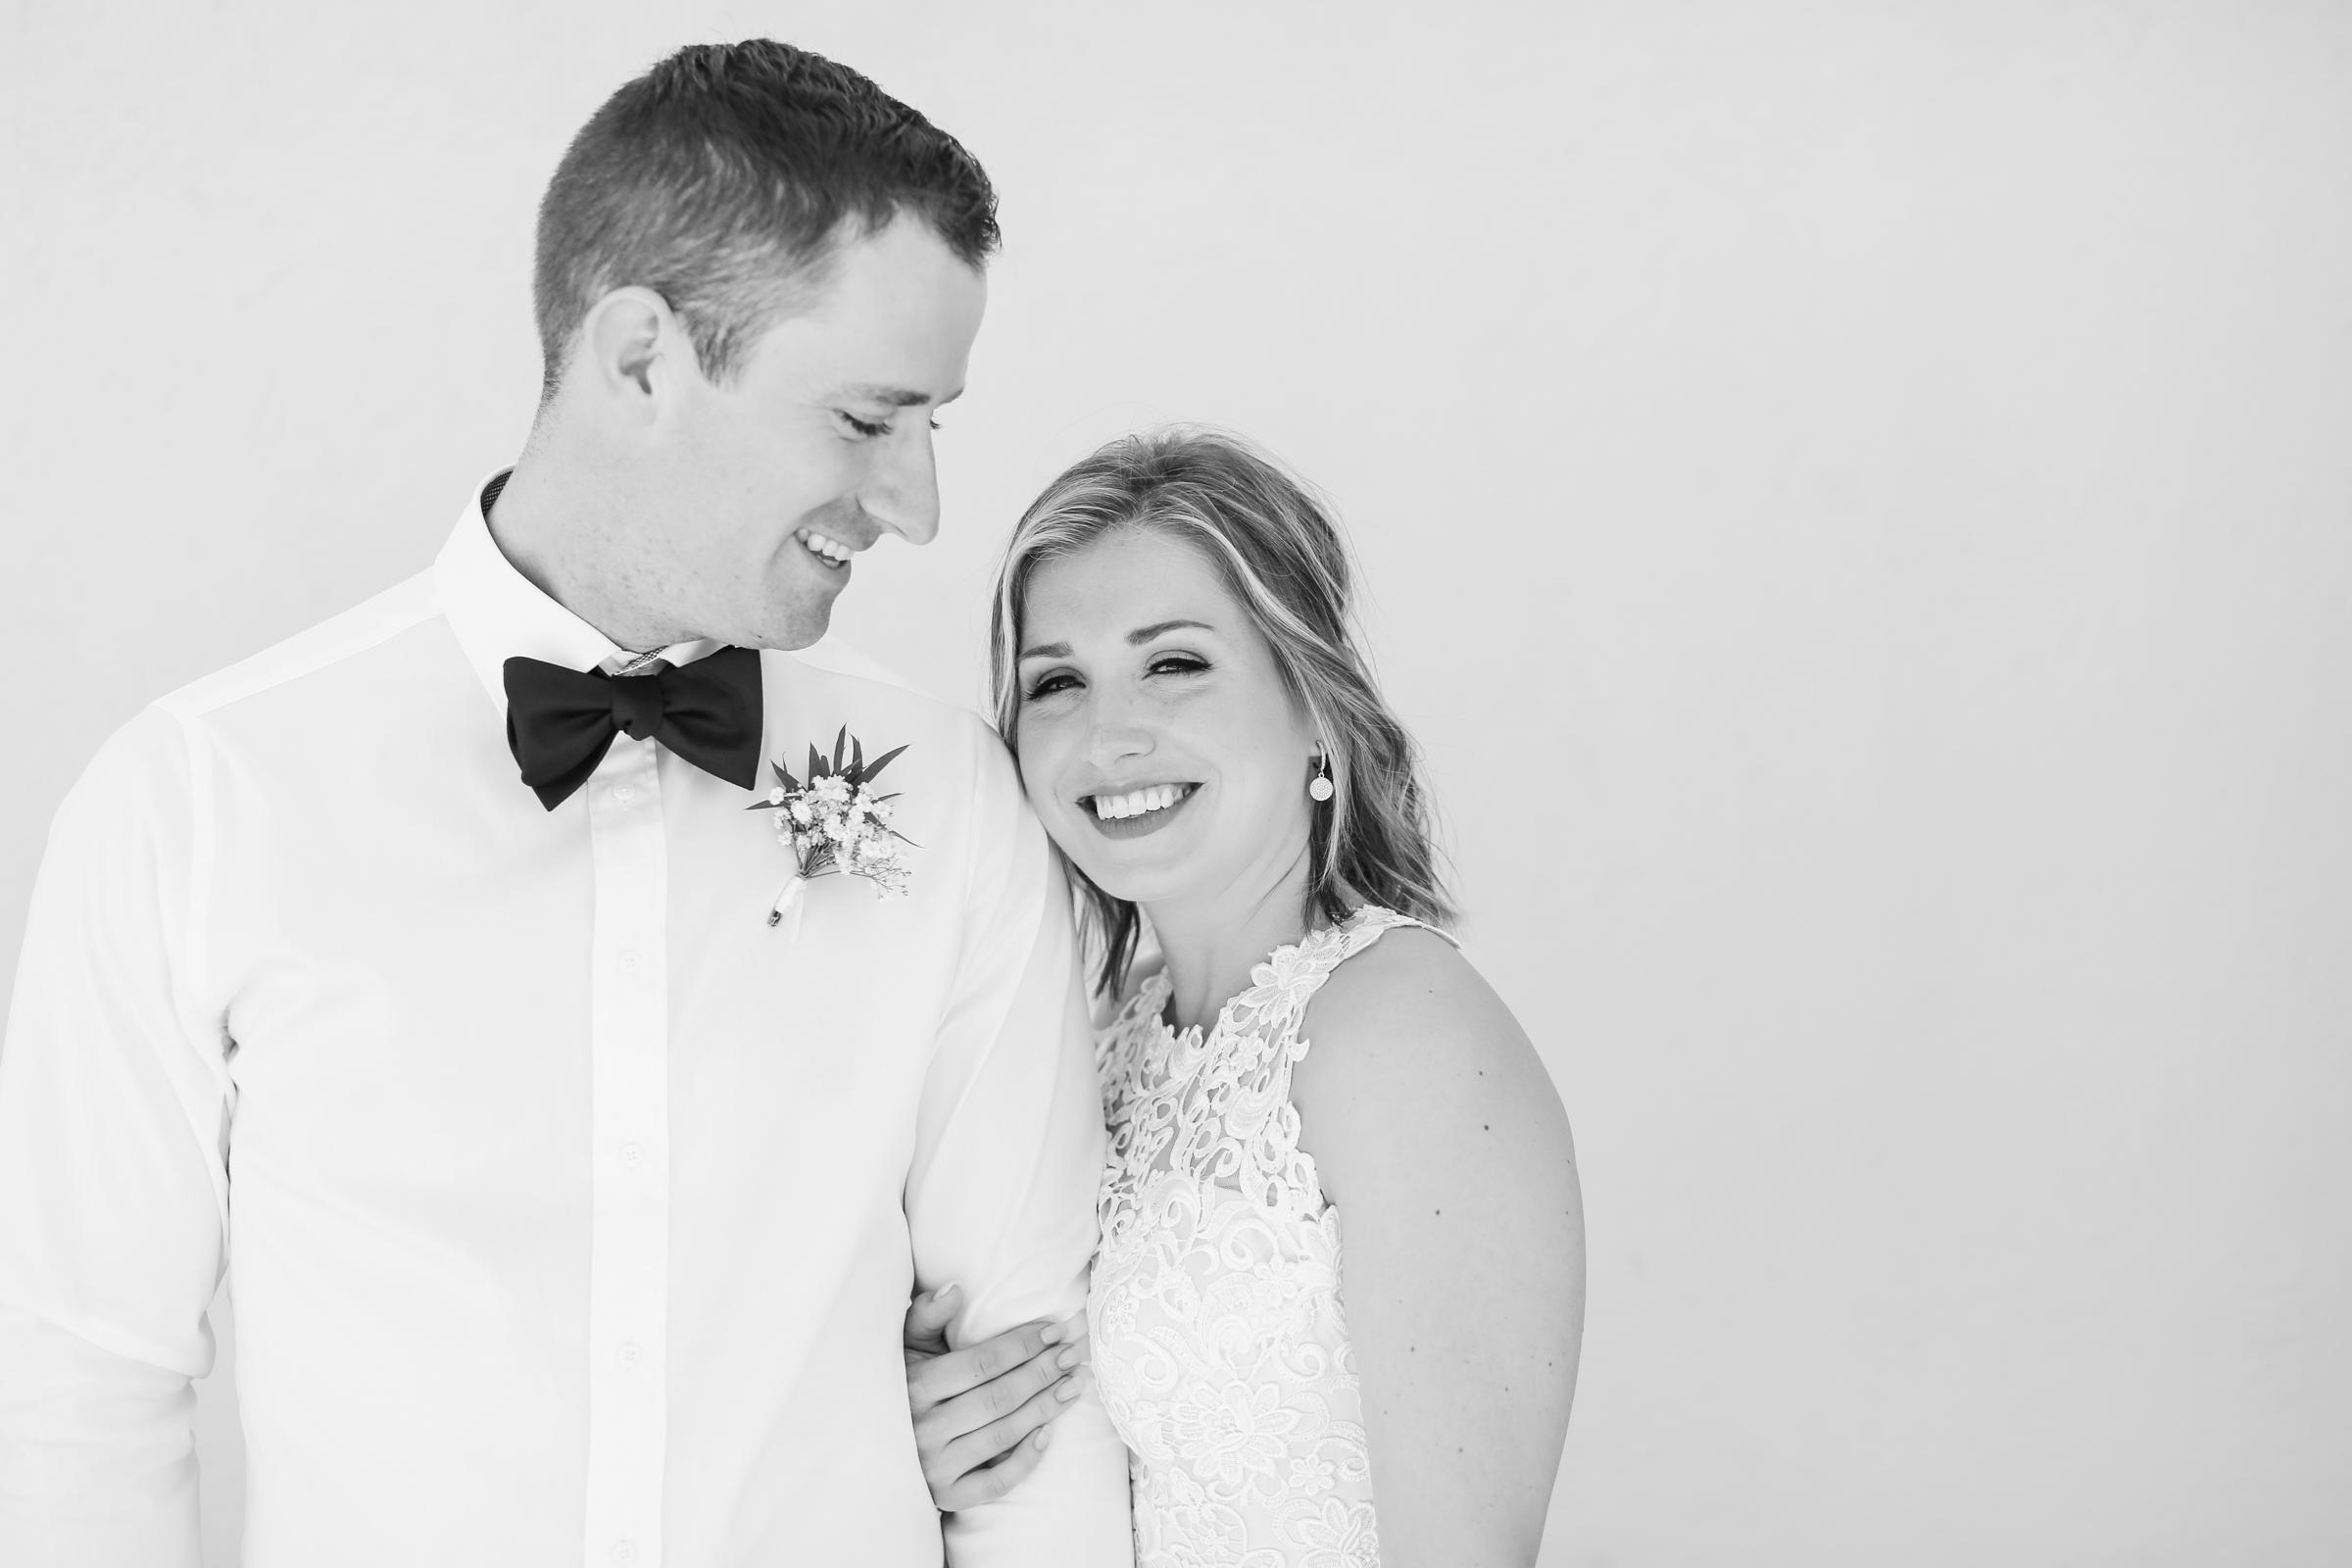 Katie+Chris-Mexico-Wedding-46.jpg